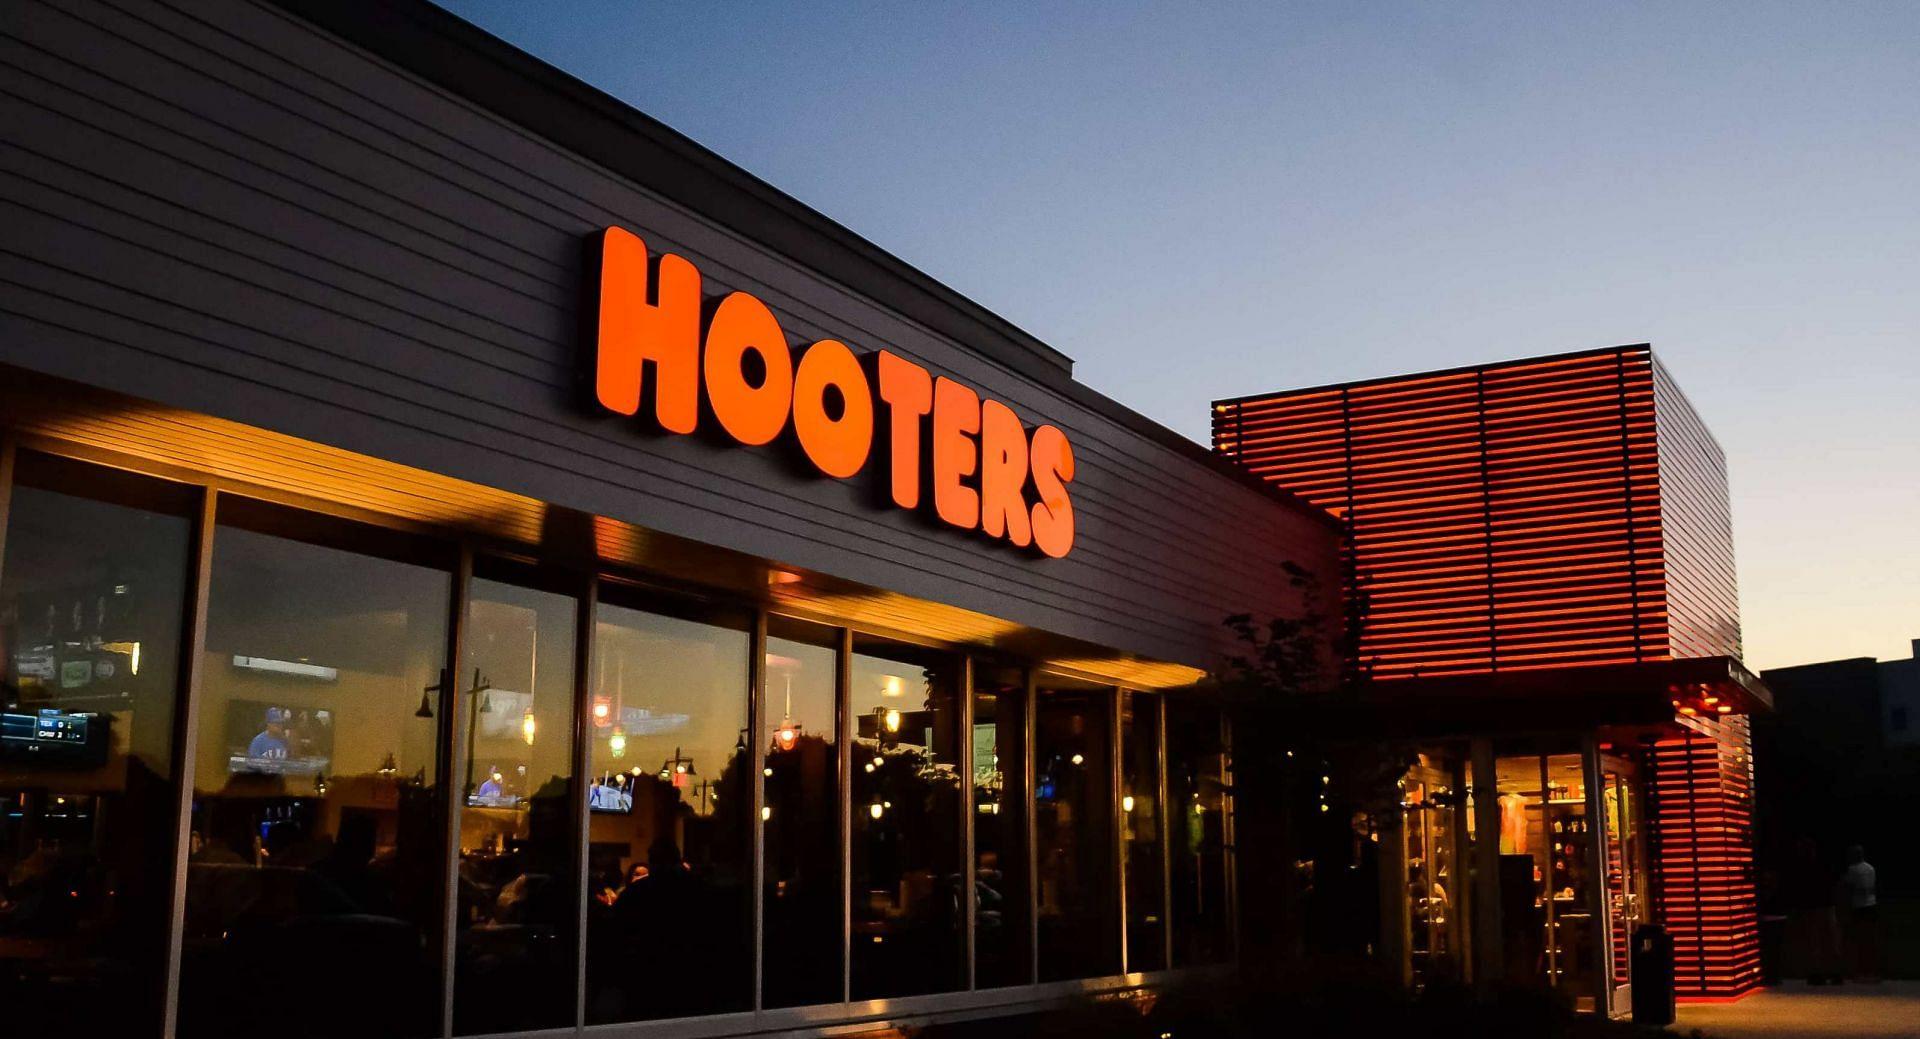 """Way too short"" - New Hooters uniform sparks raging debate online"